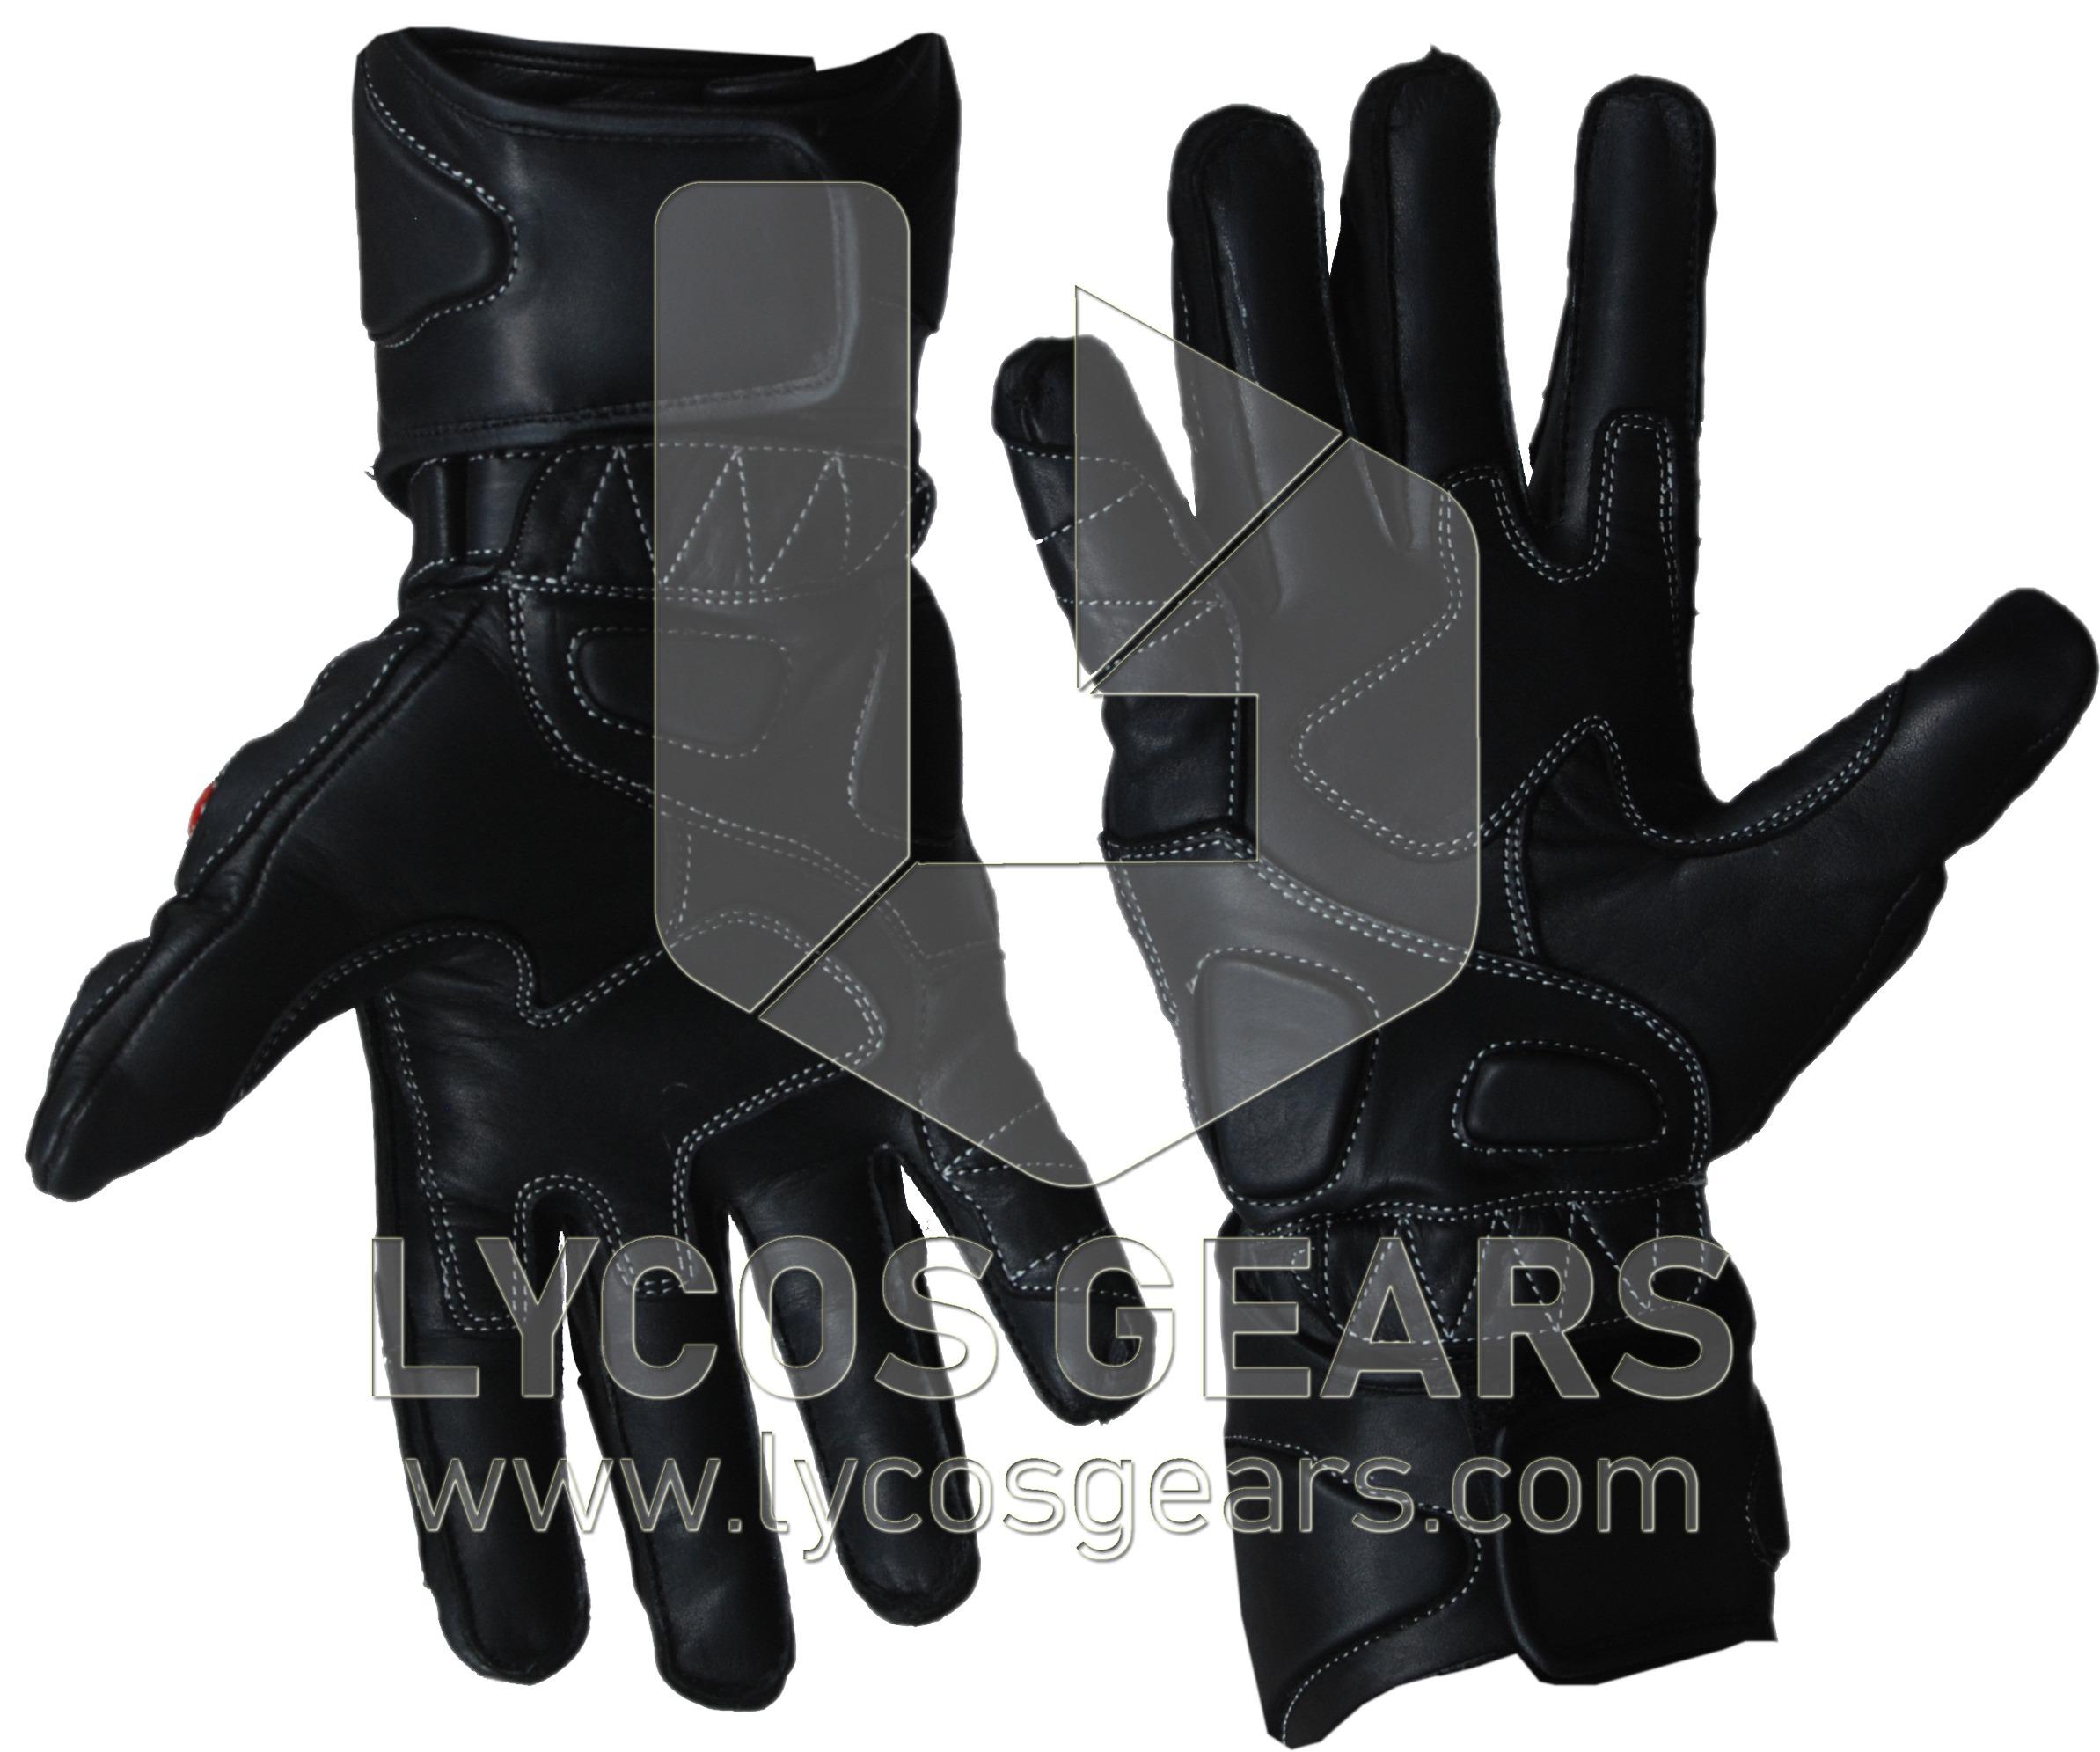 Motorbike Racing Leather Gloves motorbike leather jacket motorbike leathers motorbike leather gloves motorbike gloves motorbike leather gloves motorbike shop motorbike gloves black motorbike gloves motorbike gloves motorbike gloves motorbike gloves leather